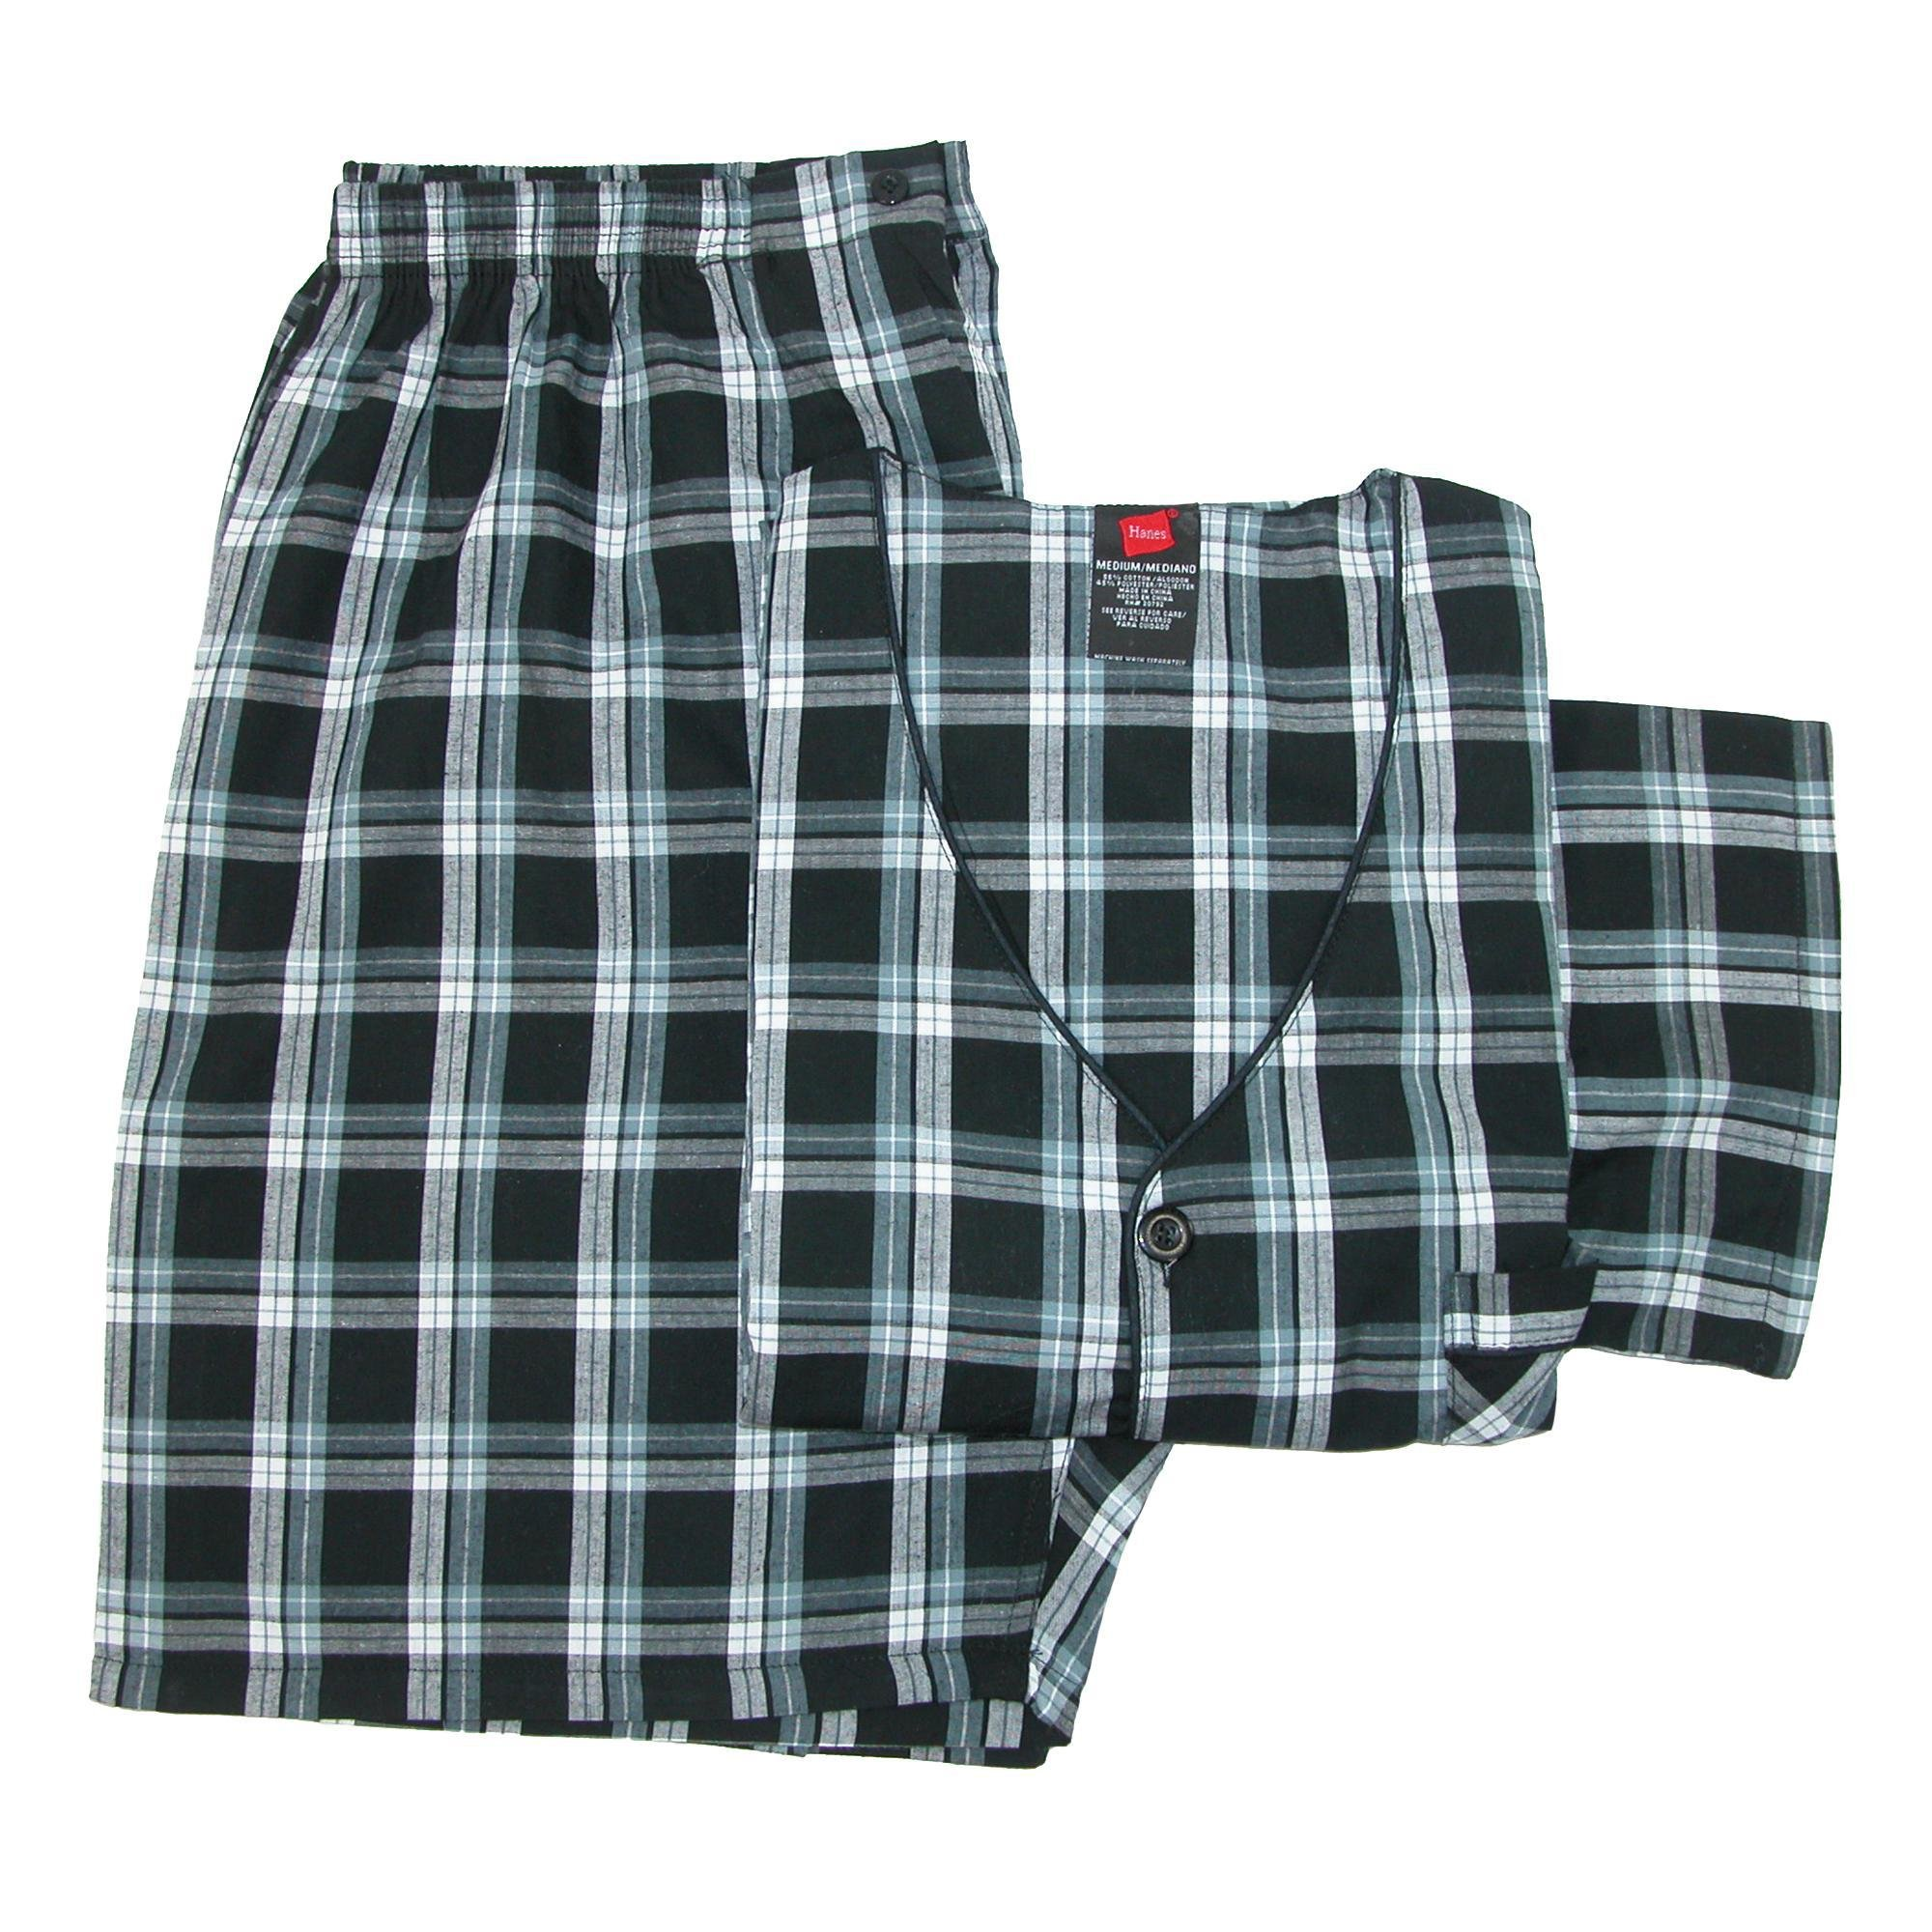 Hanes Men's Short Sleeve Short Leg Pajama Set, XL, Black